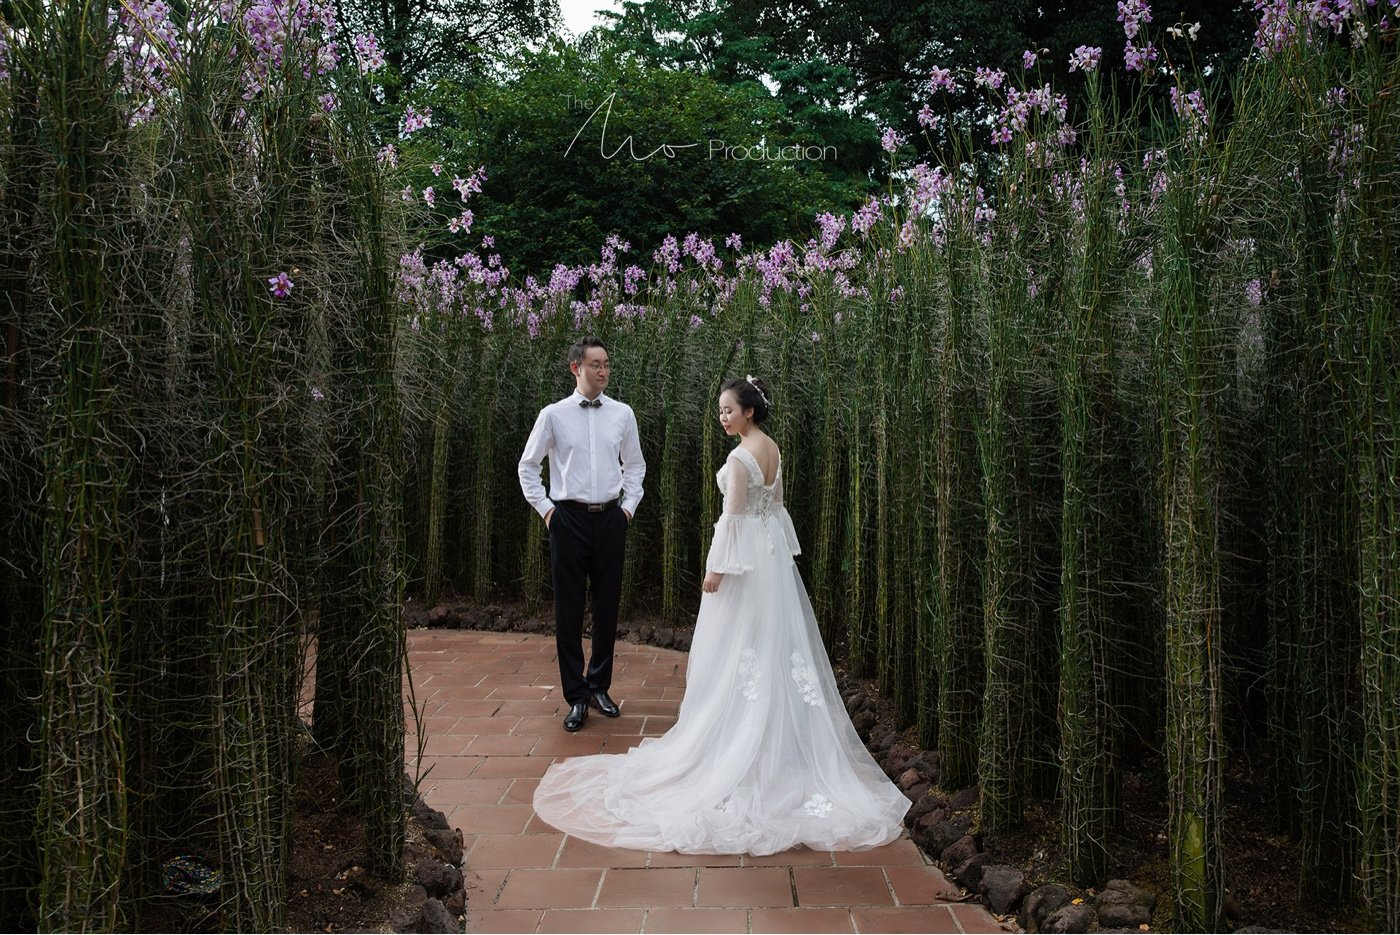 MoFoTo | 新加坡旅拍婚纱8